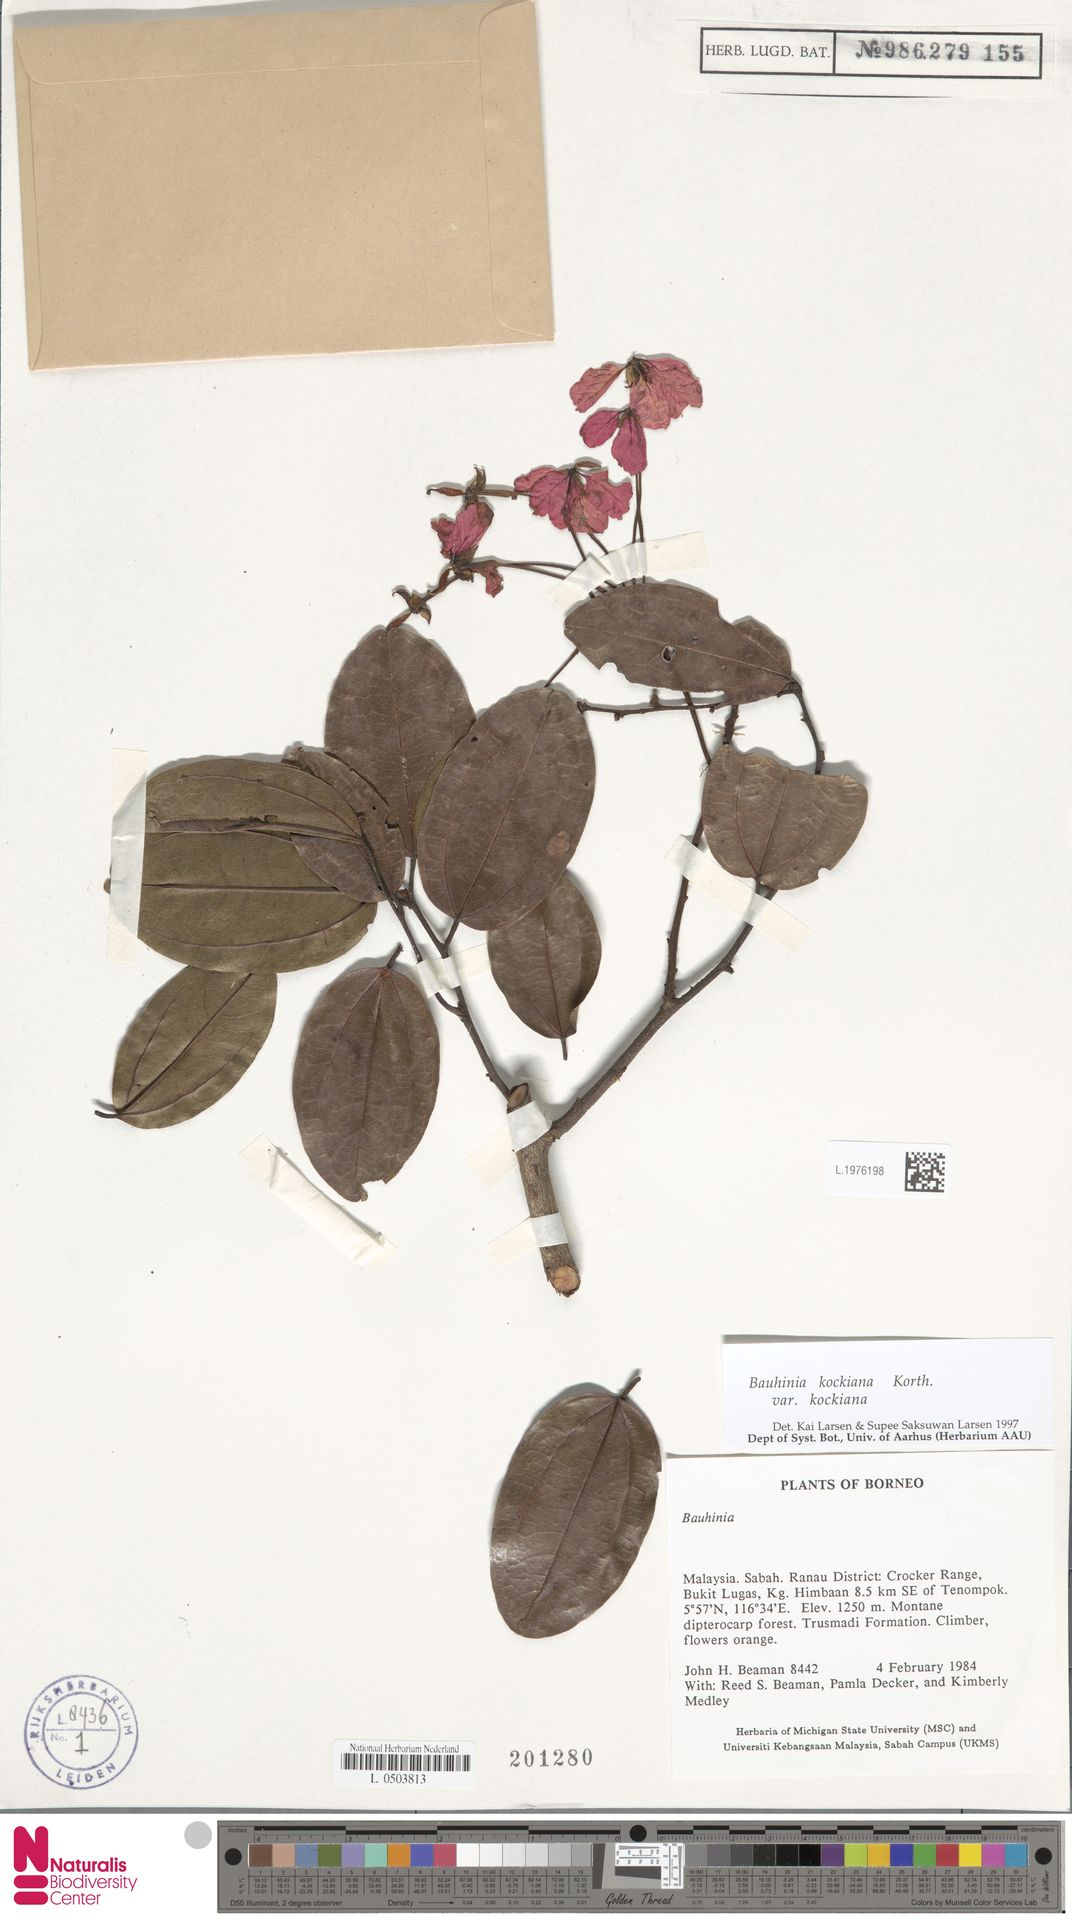 L.1976198 | Bauhinia kockiana var. kockiana